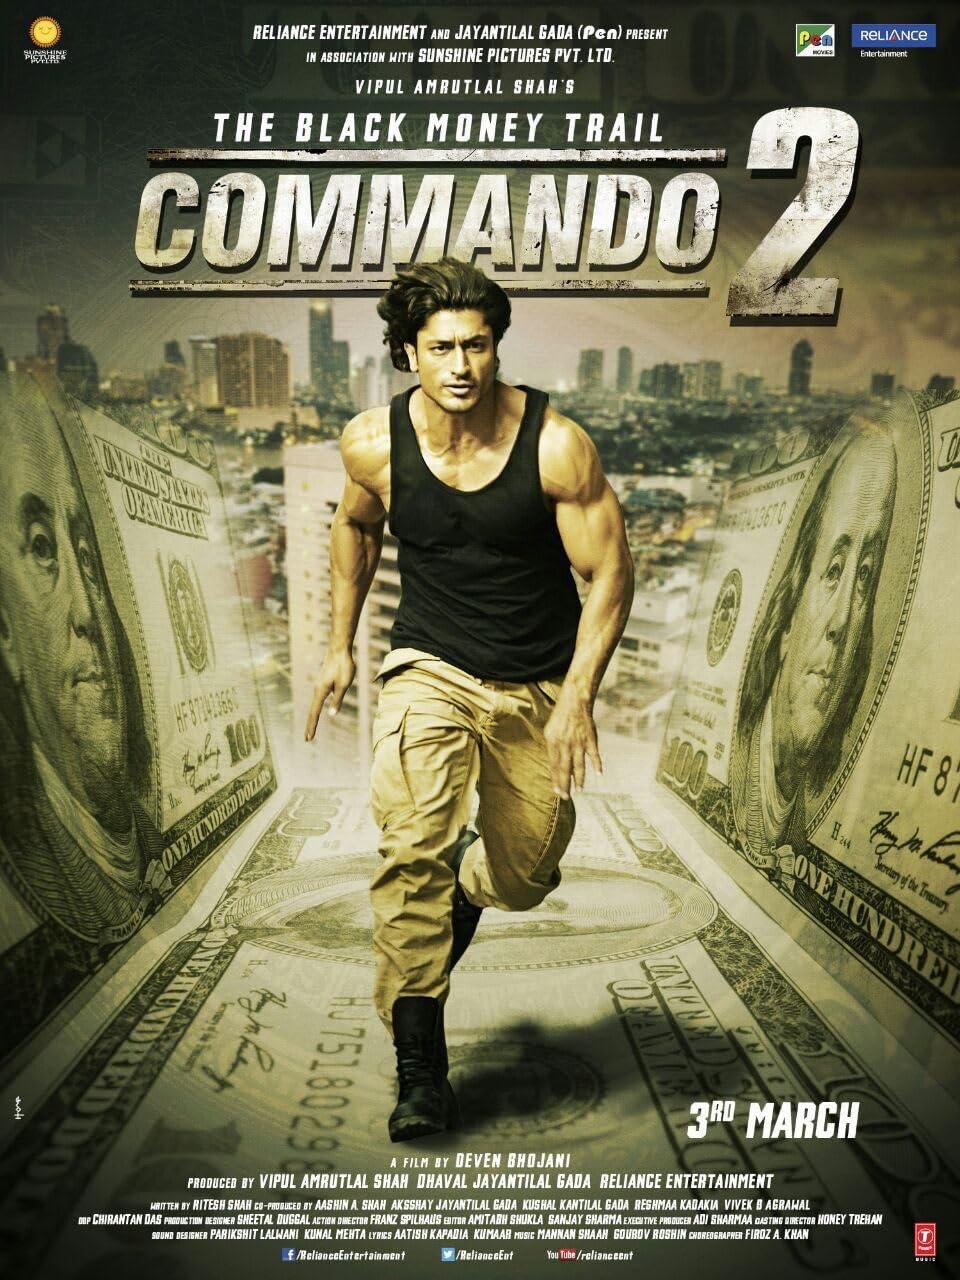 Commando 2: The Black Money Trail (2017) centmovies.xyz